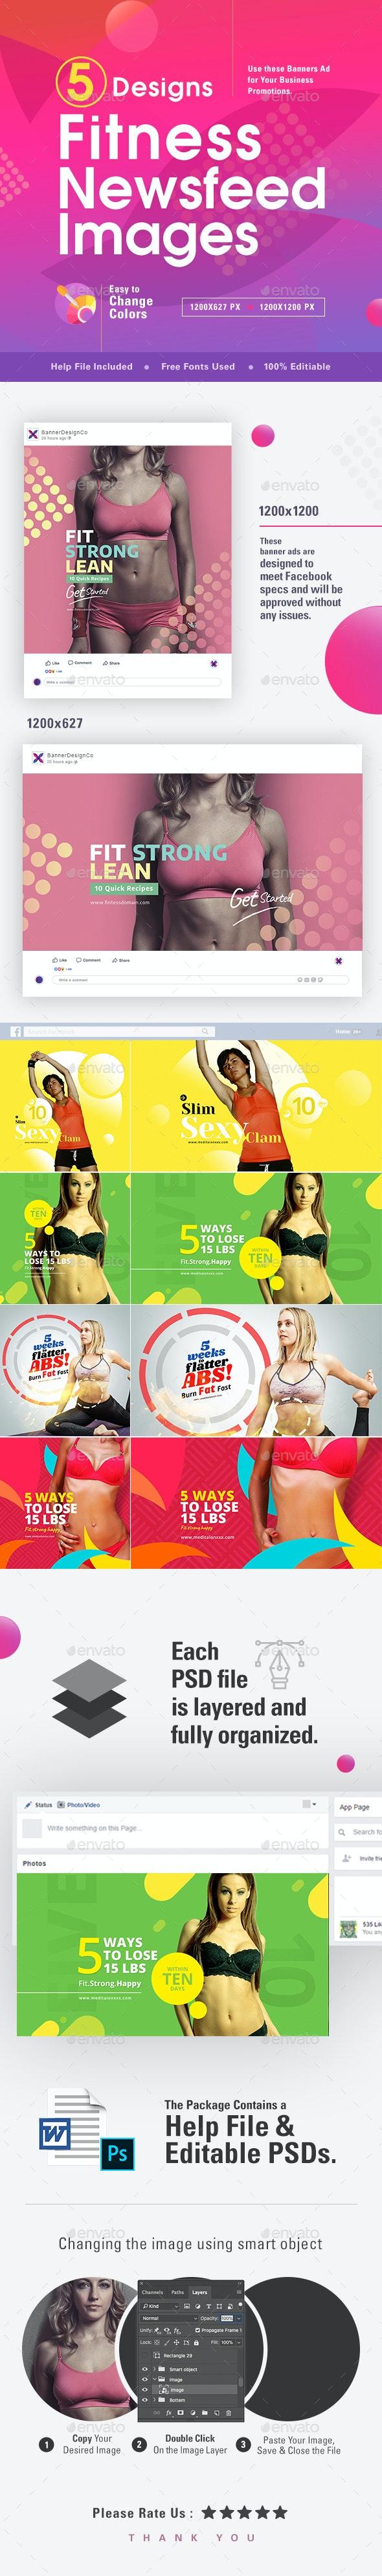 Fitness Social Media Banners - 10 Designs - Miscellaneous Social Media